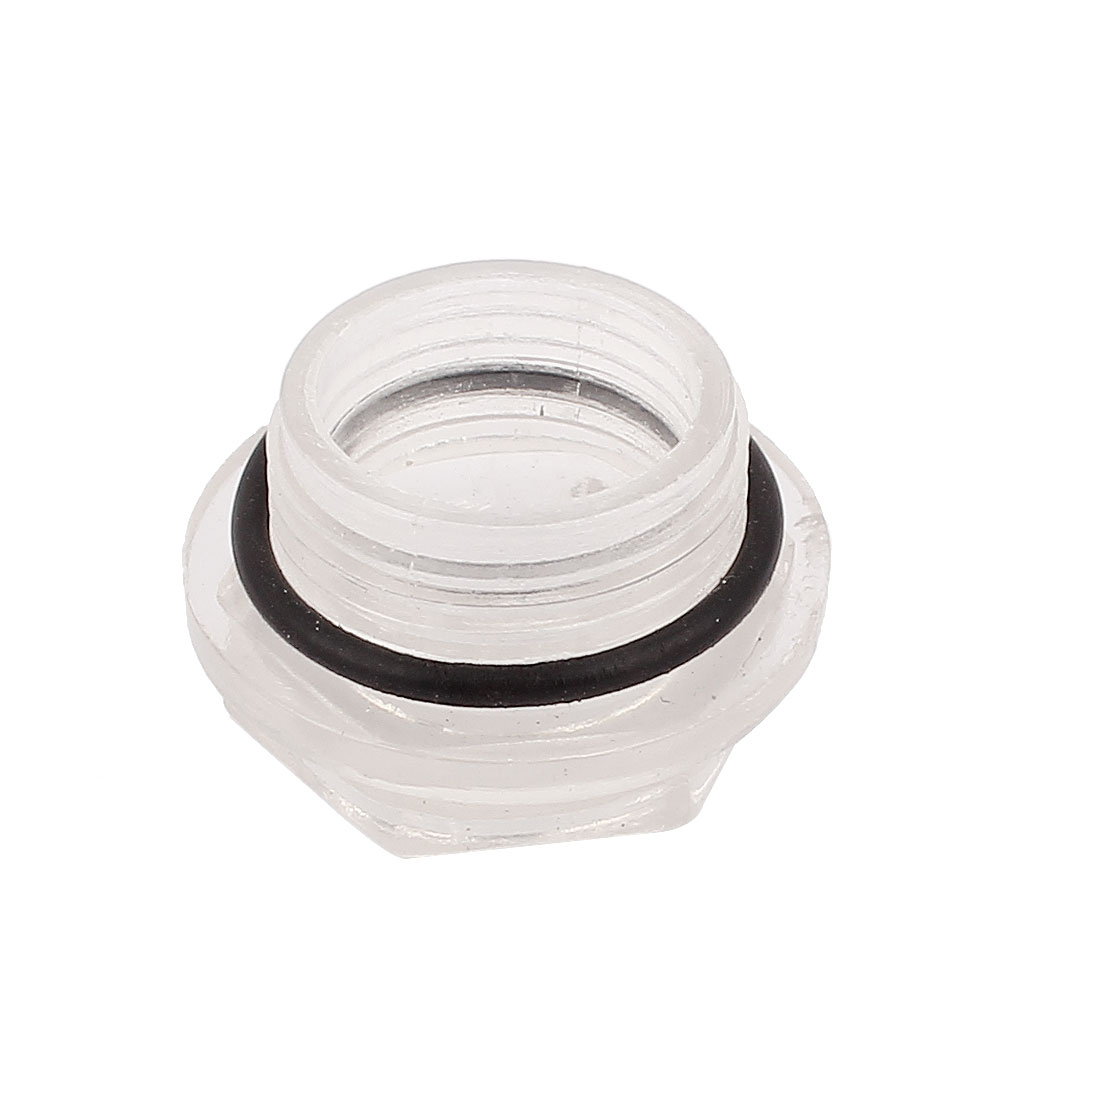 25mm Threaded Dia Hex Head Air Compressor Oil Level Liquid Sight Glass